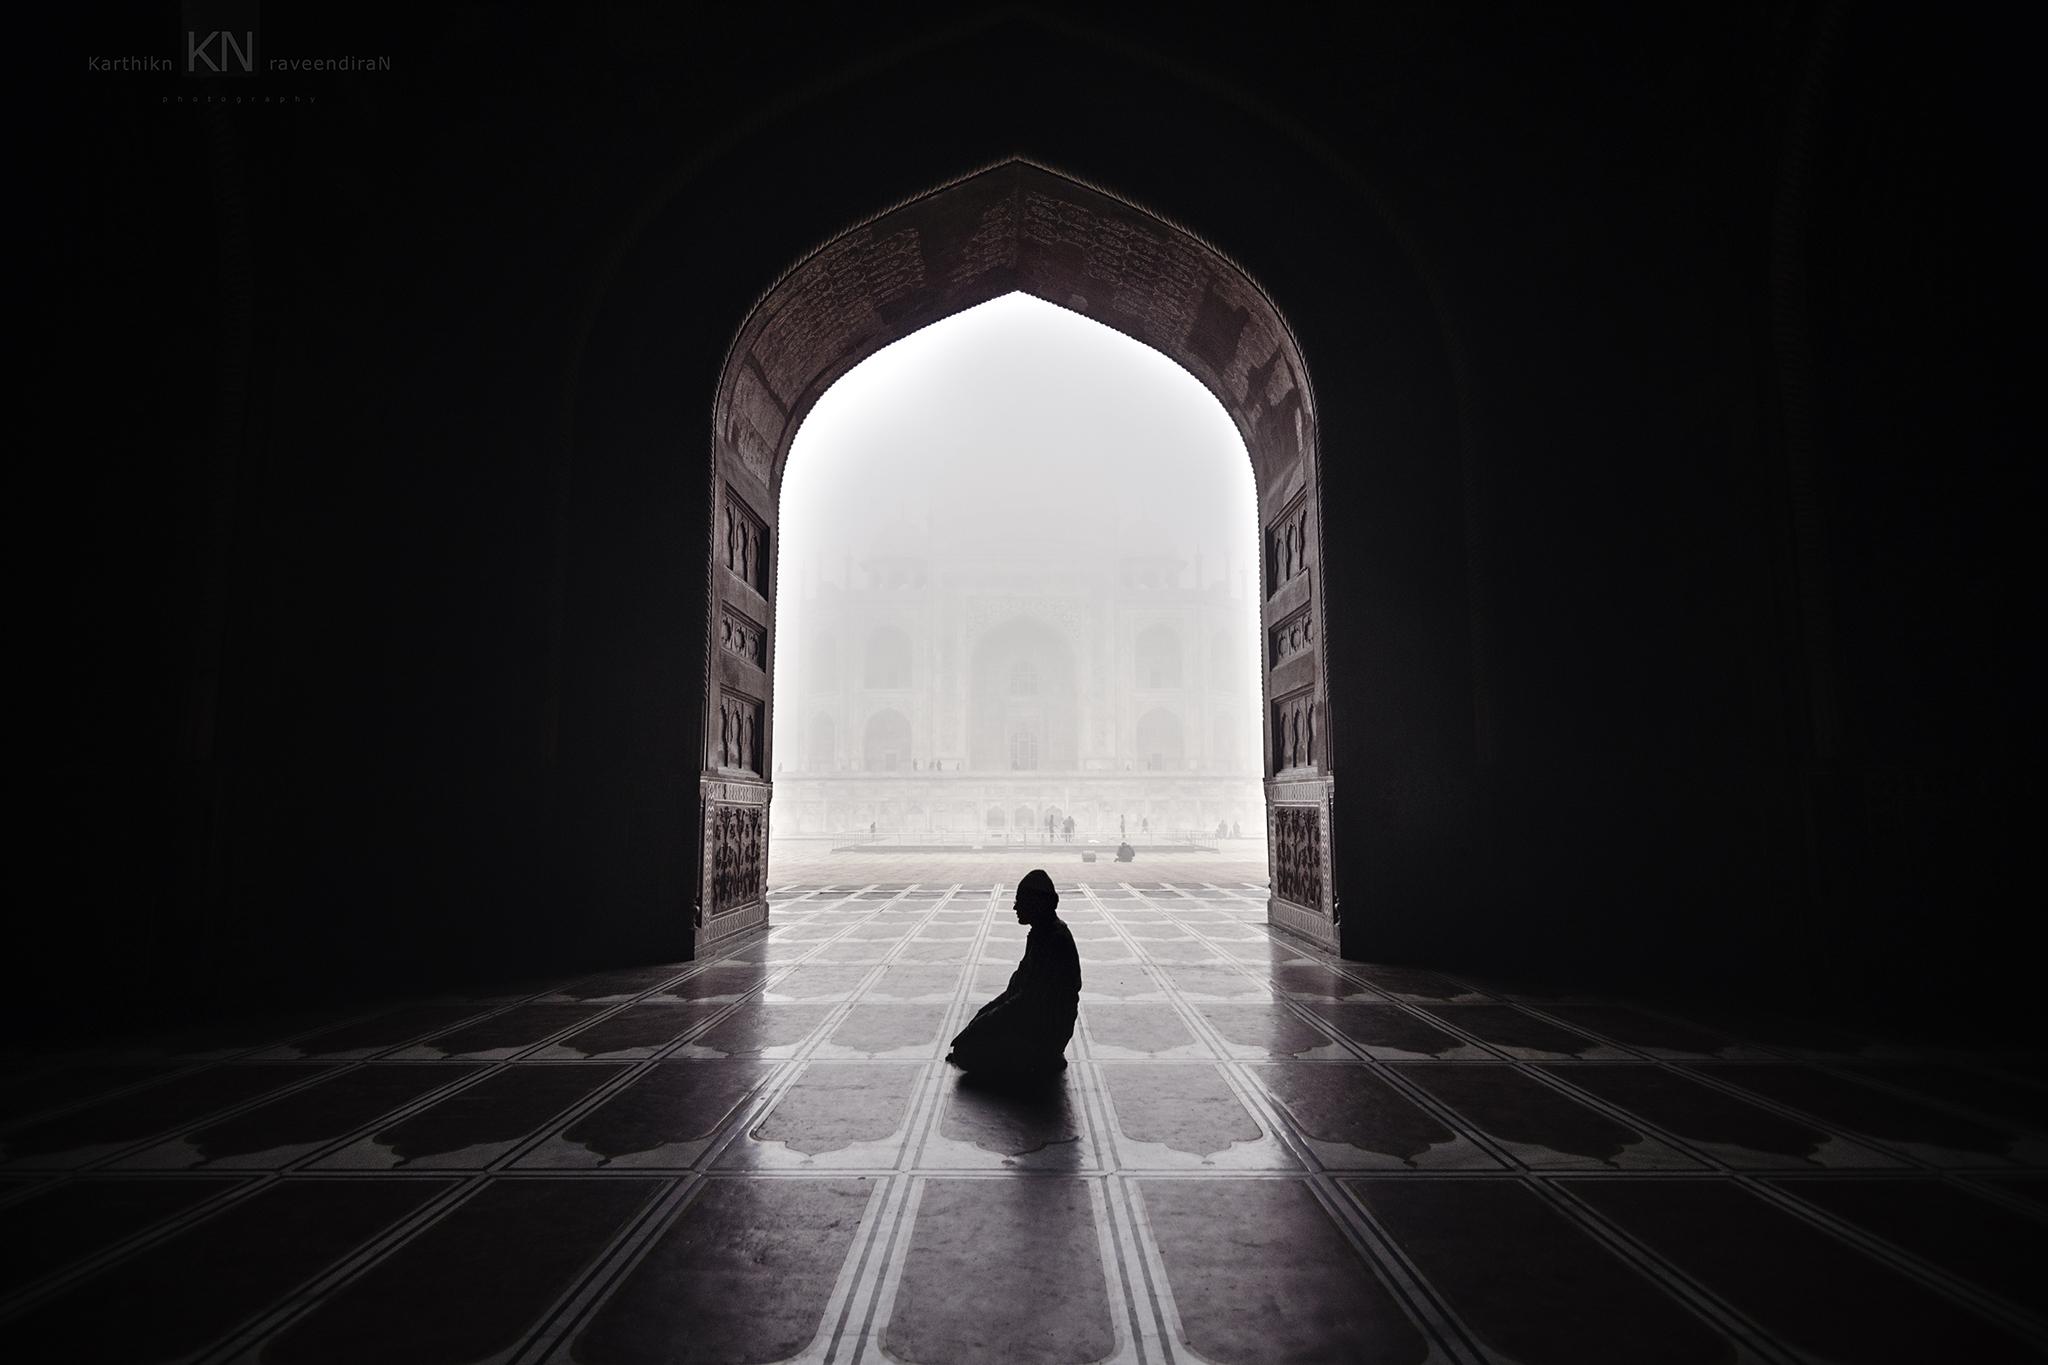 Wallpapers Of Sallah: Wallpaper : India, Architecture, Indian, Islam, Prayer